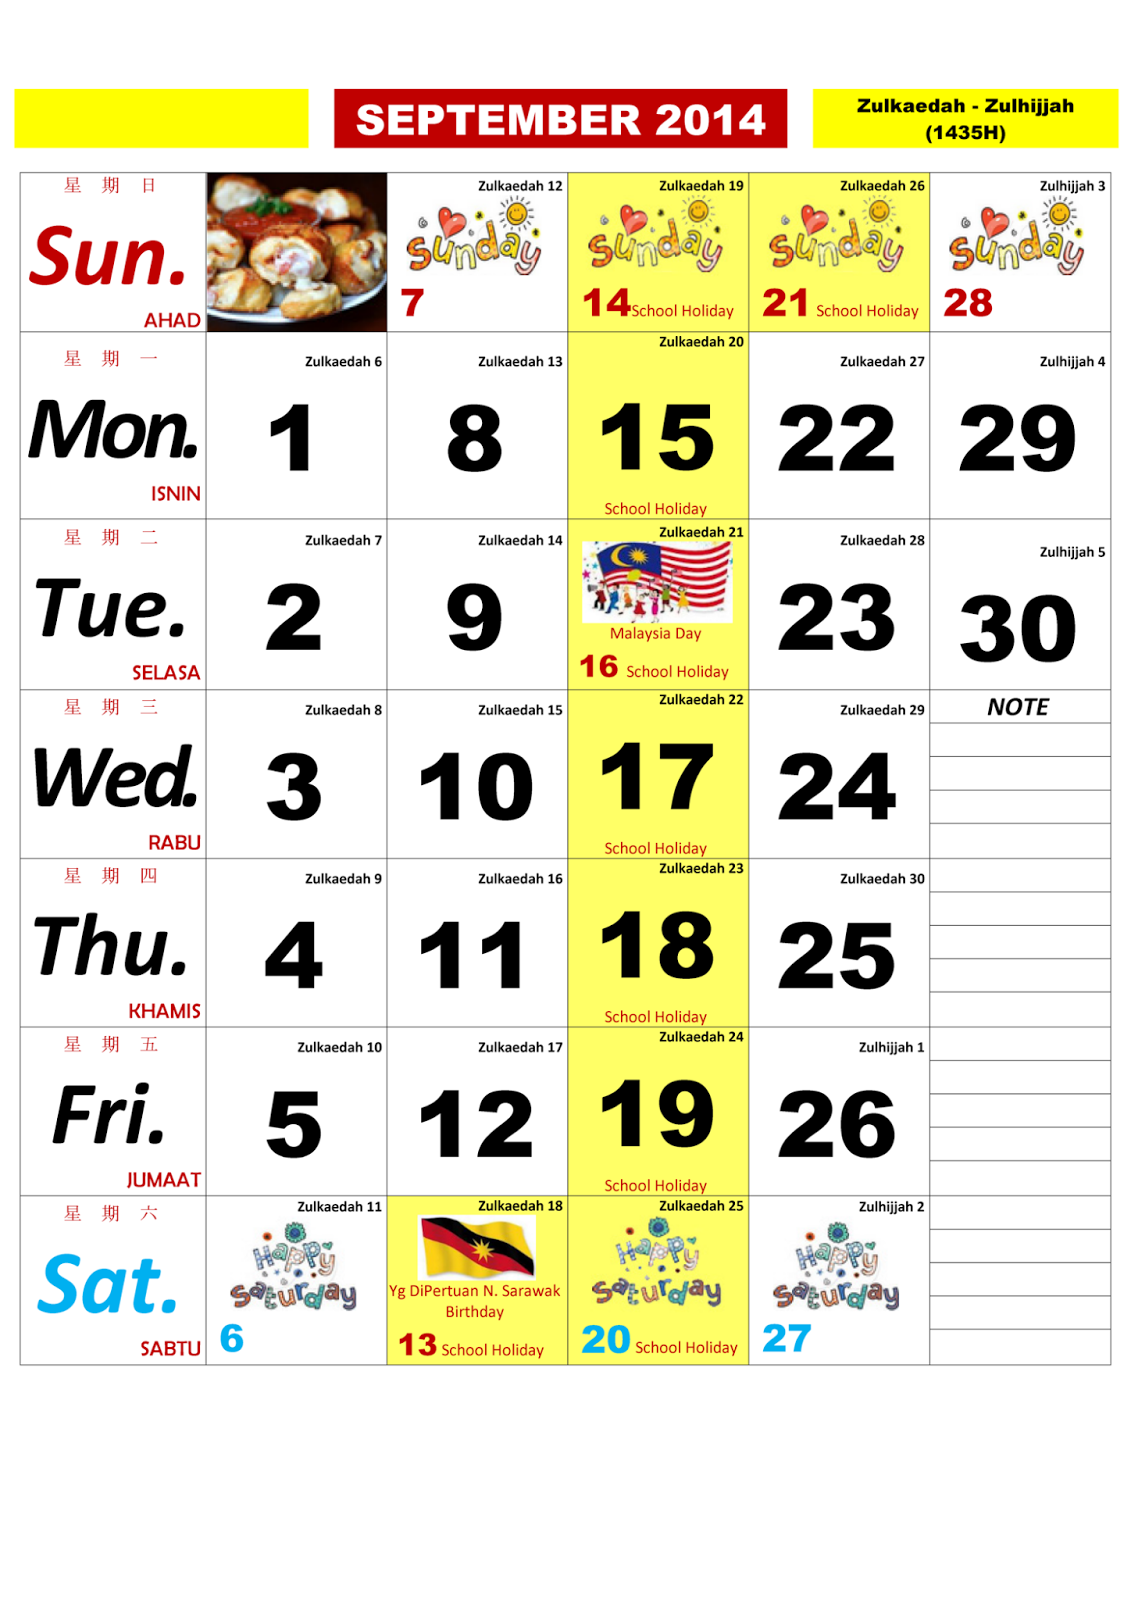 Kalendar+Kuda-2014+eatz+HQ_September+(1).png